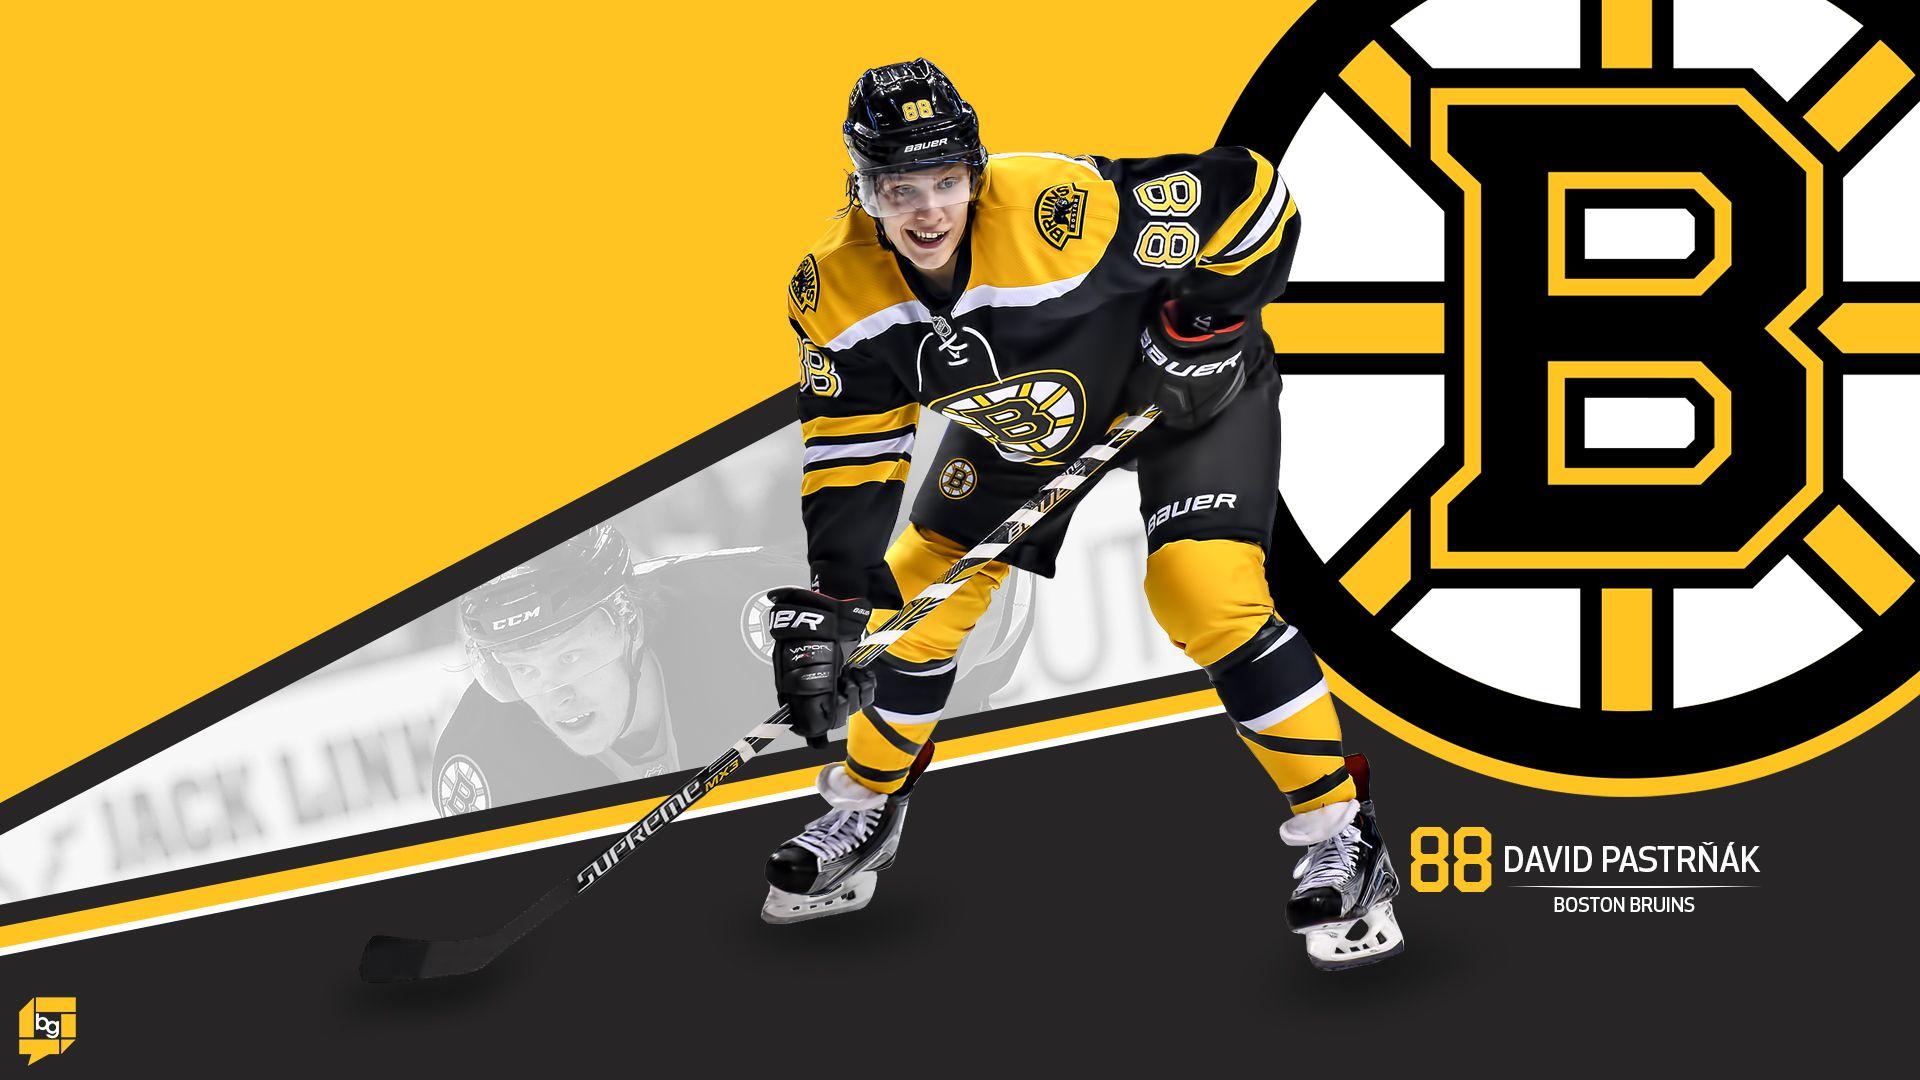 Boston Bruins Wallpaper Free Download Boston Bruins Wallpaper Boston Bruins Boston Bruins Logo